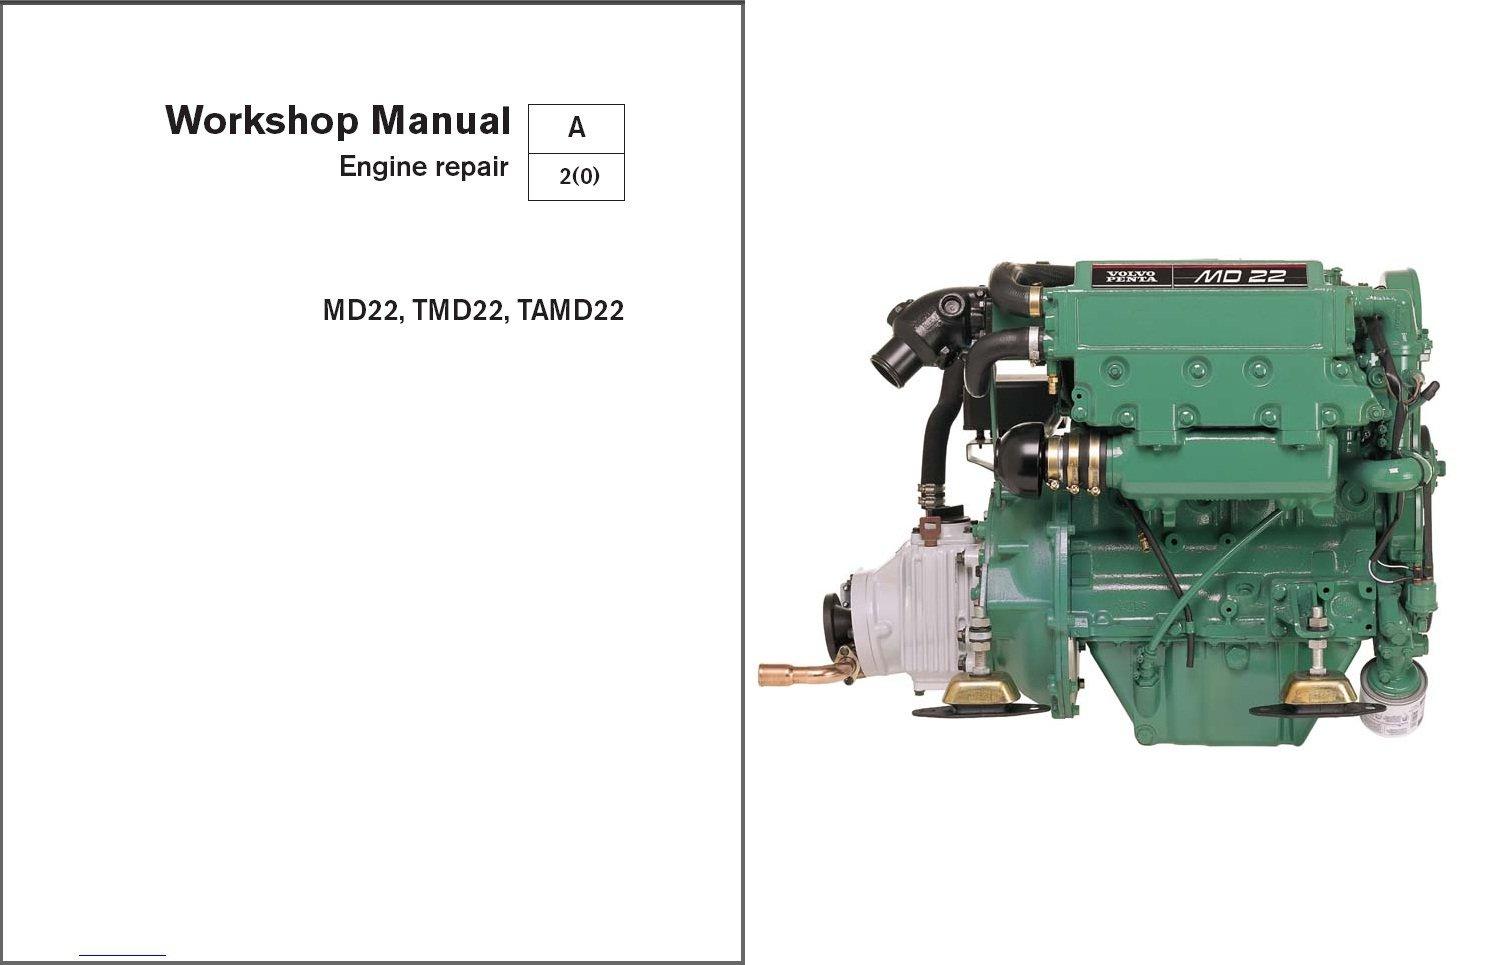 volvo penta md22, tmd22, tamd22 marine engines service repair manual cd Volvo Penta Lower Unit